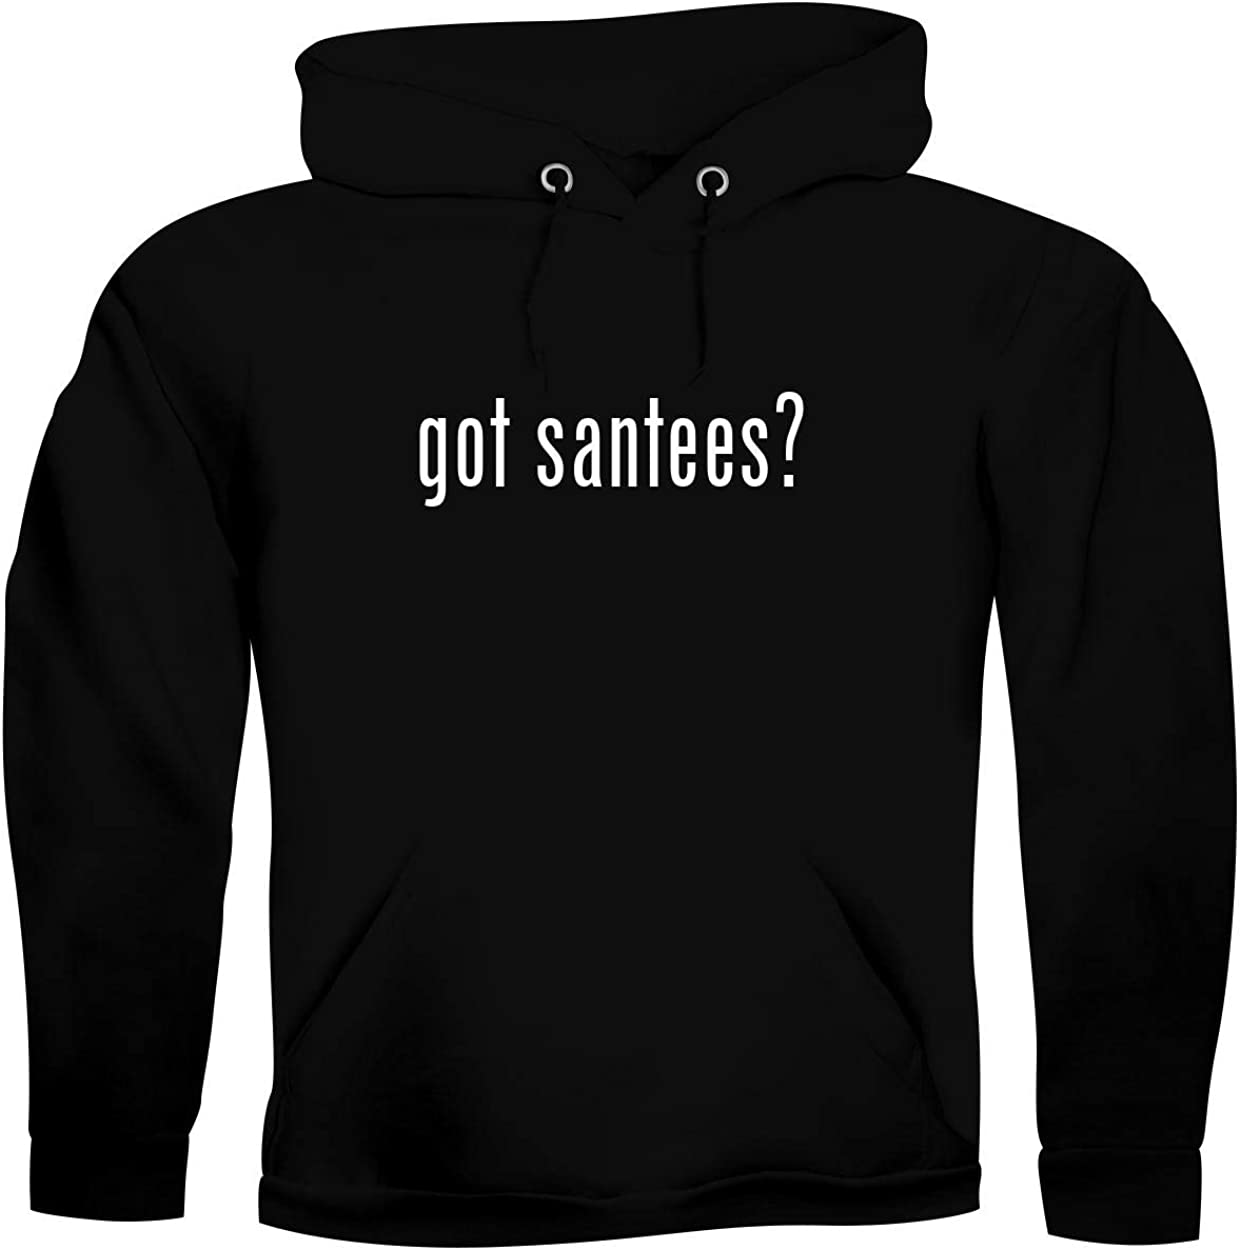 got santees? - Men's Ultra Soft Hoodie Sweatshirt